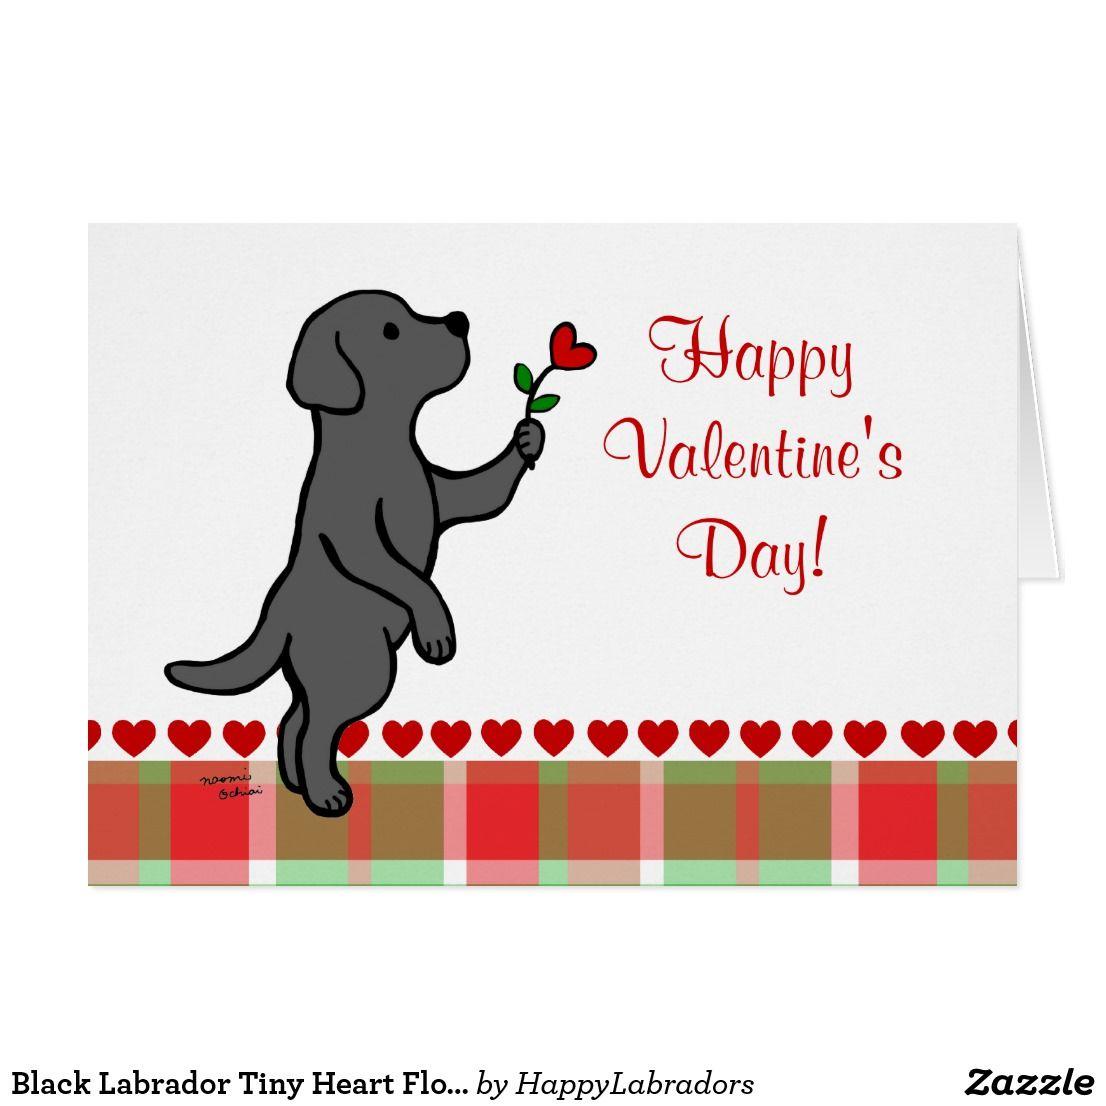 Black Labrador Tiny Heart Flower Valentine Holiday Card Zazzle Com Funny Wedding Signs Tiny Heart Black Labrador